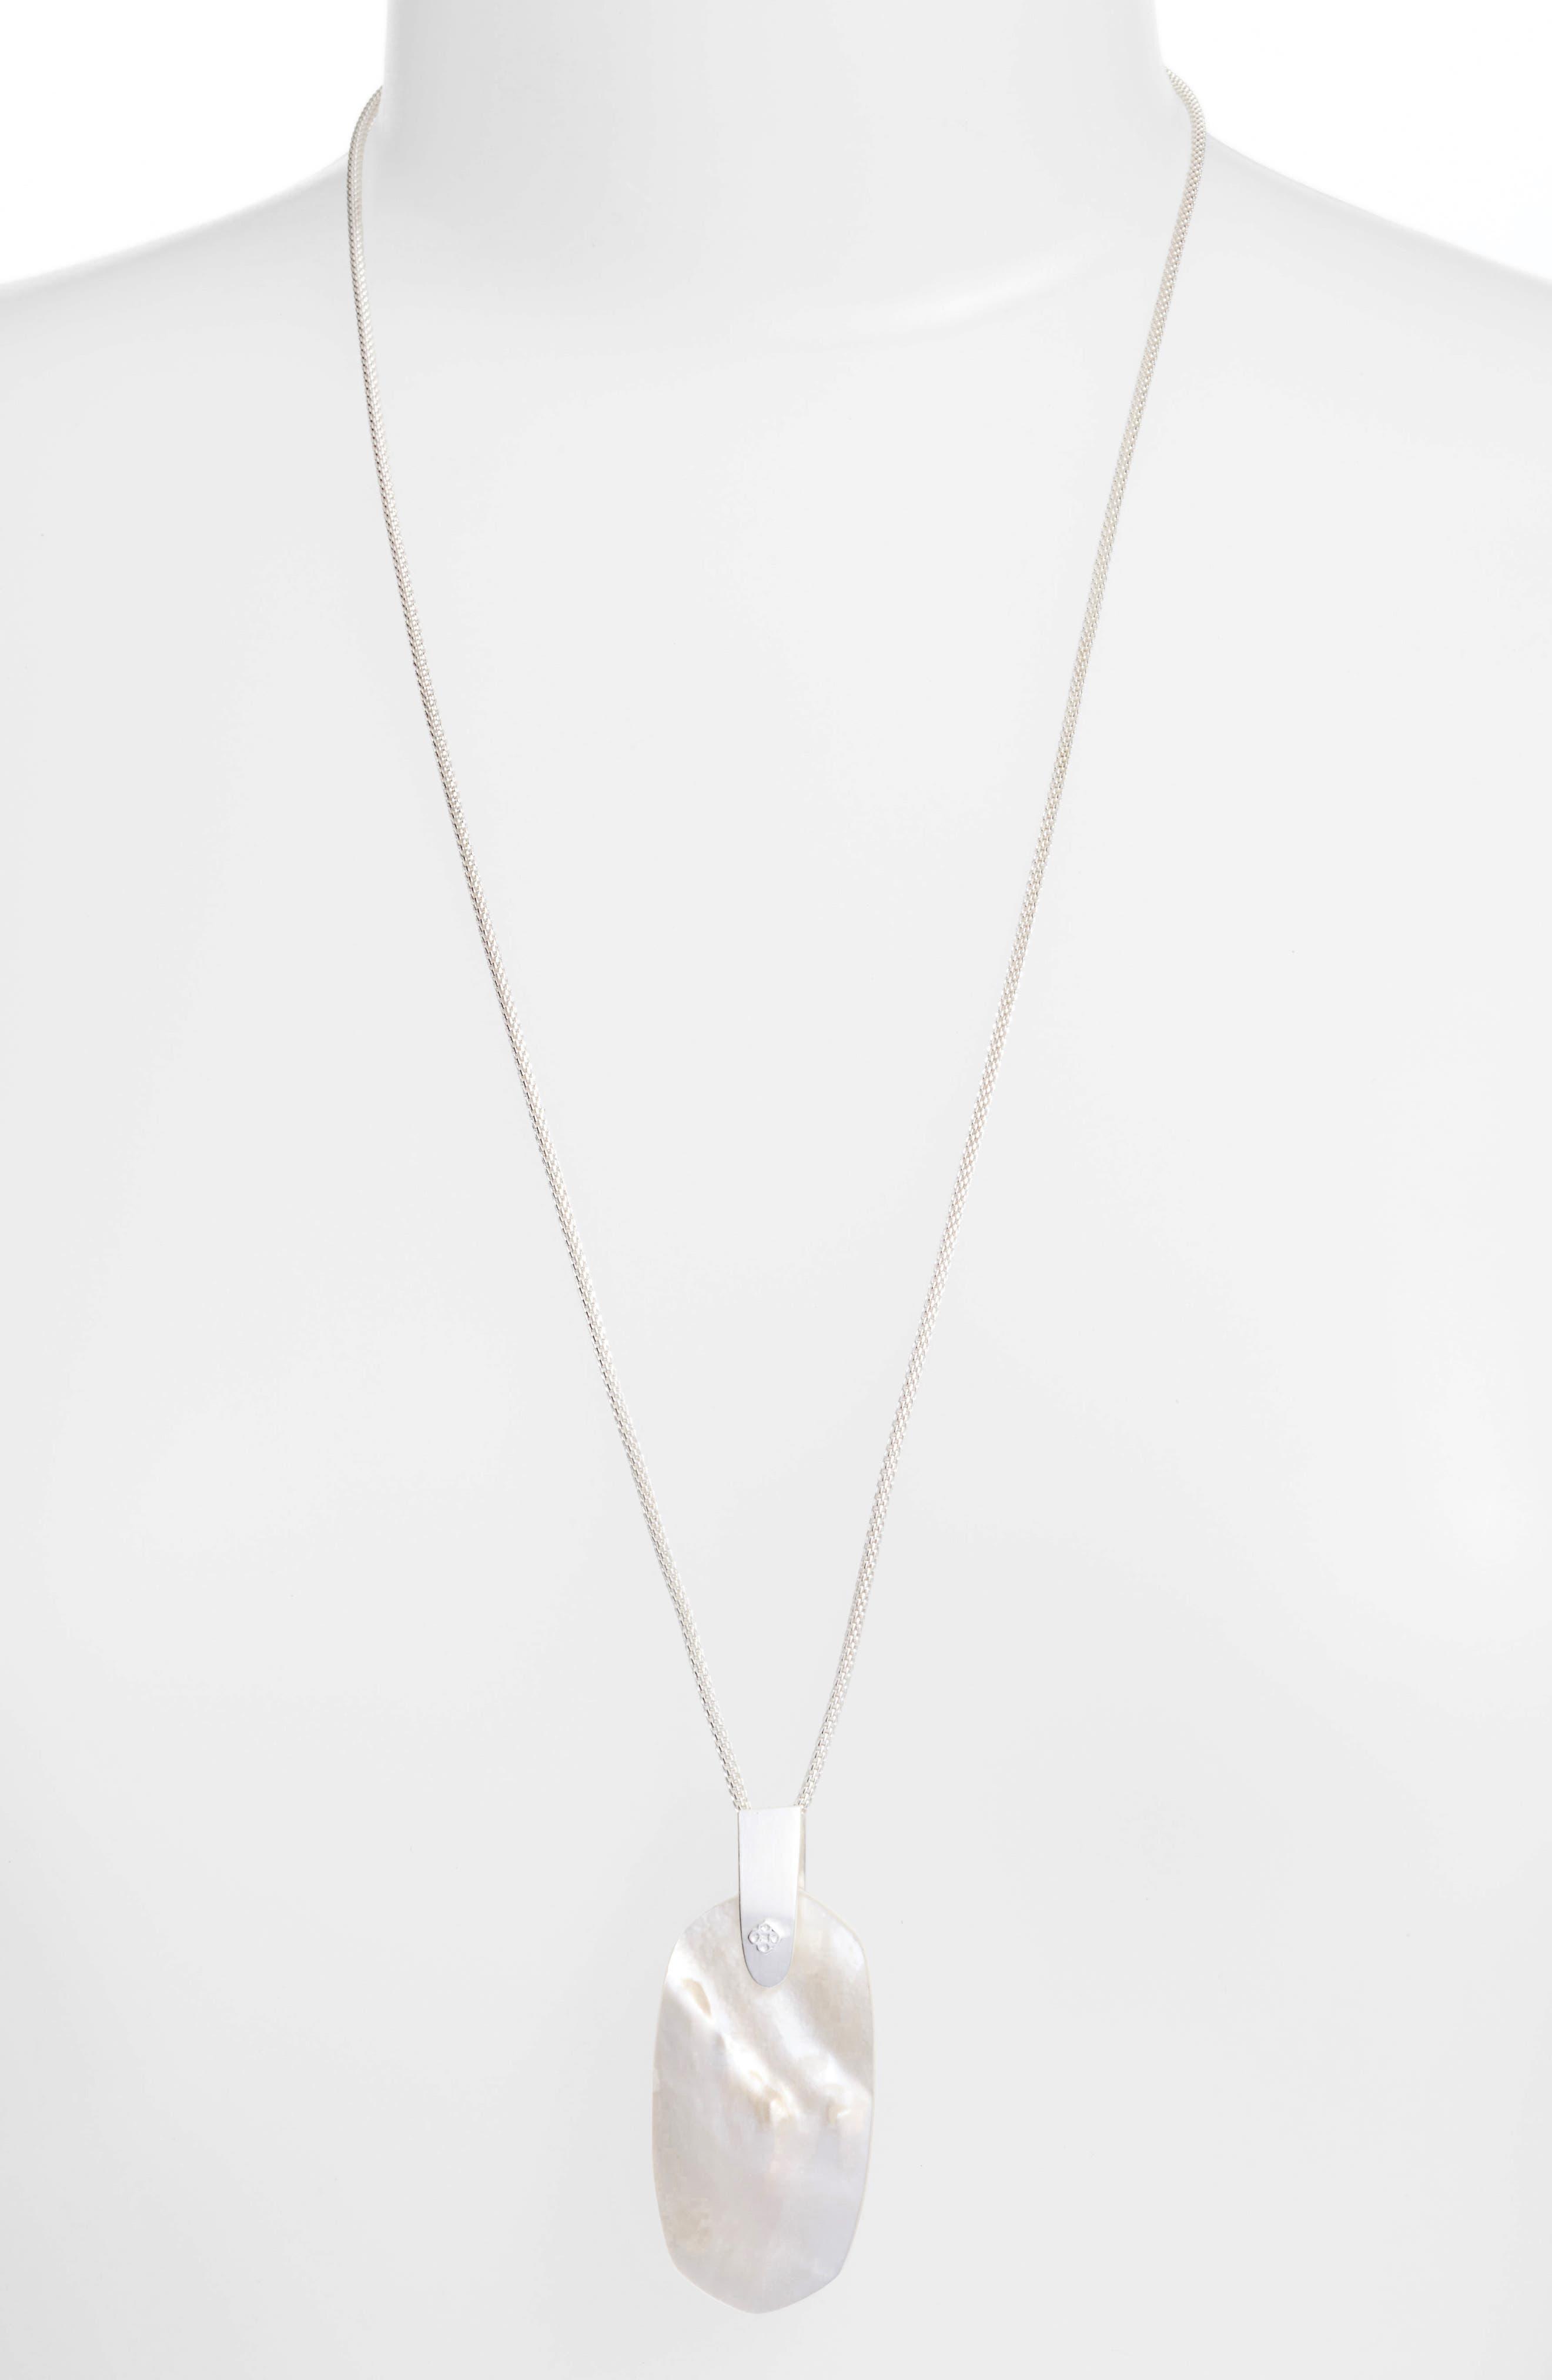 Womens long strand necklaces nordstrom kendra scott inez pendant necklace mozeypictures Choice Image